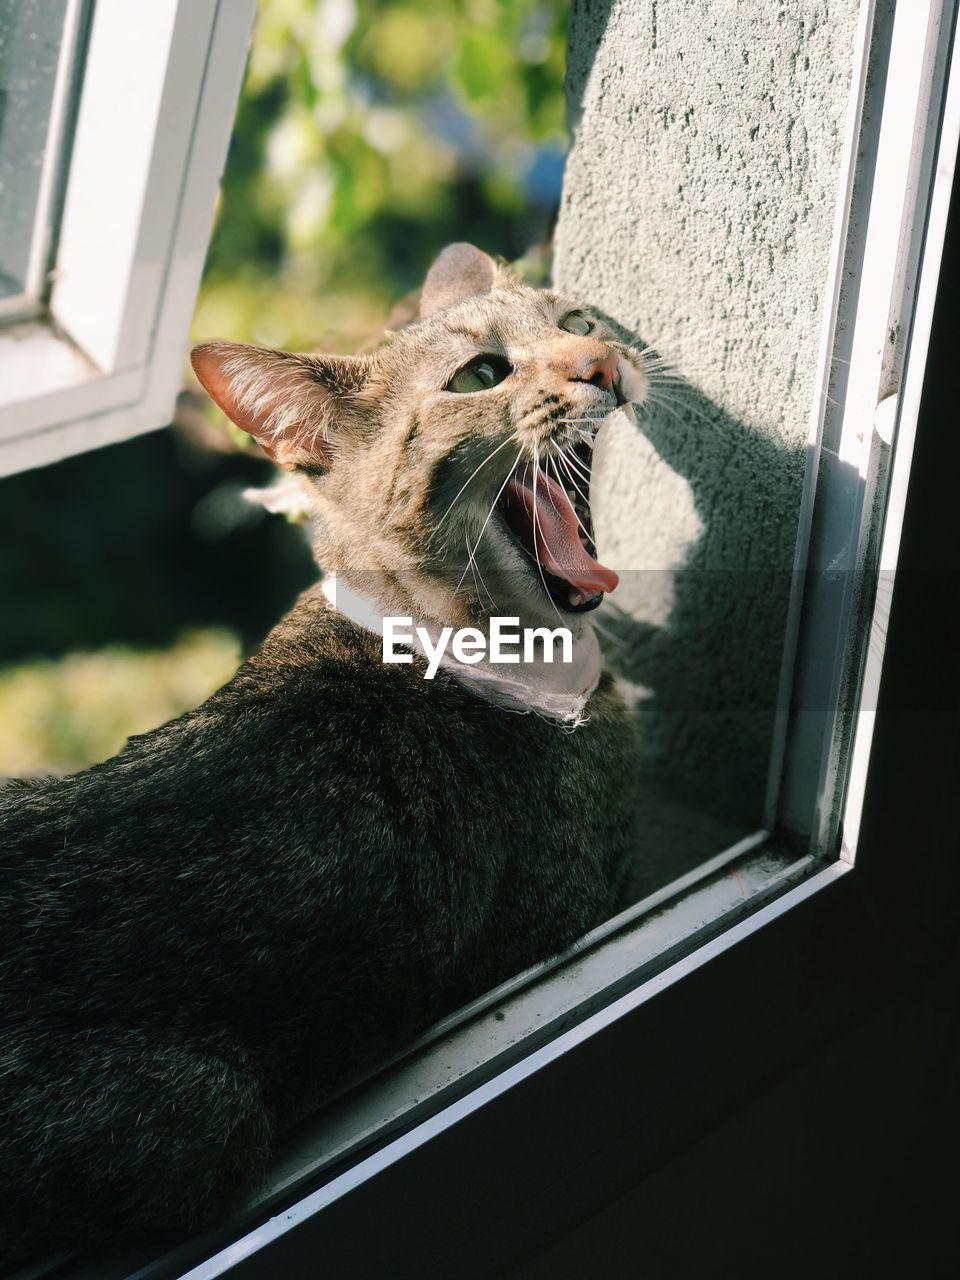 CLOSE-UP OF A ANIMAL YAWNING